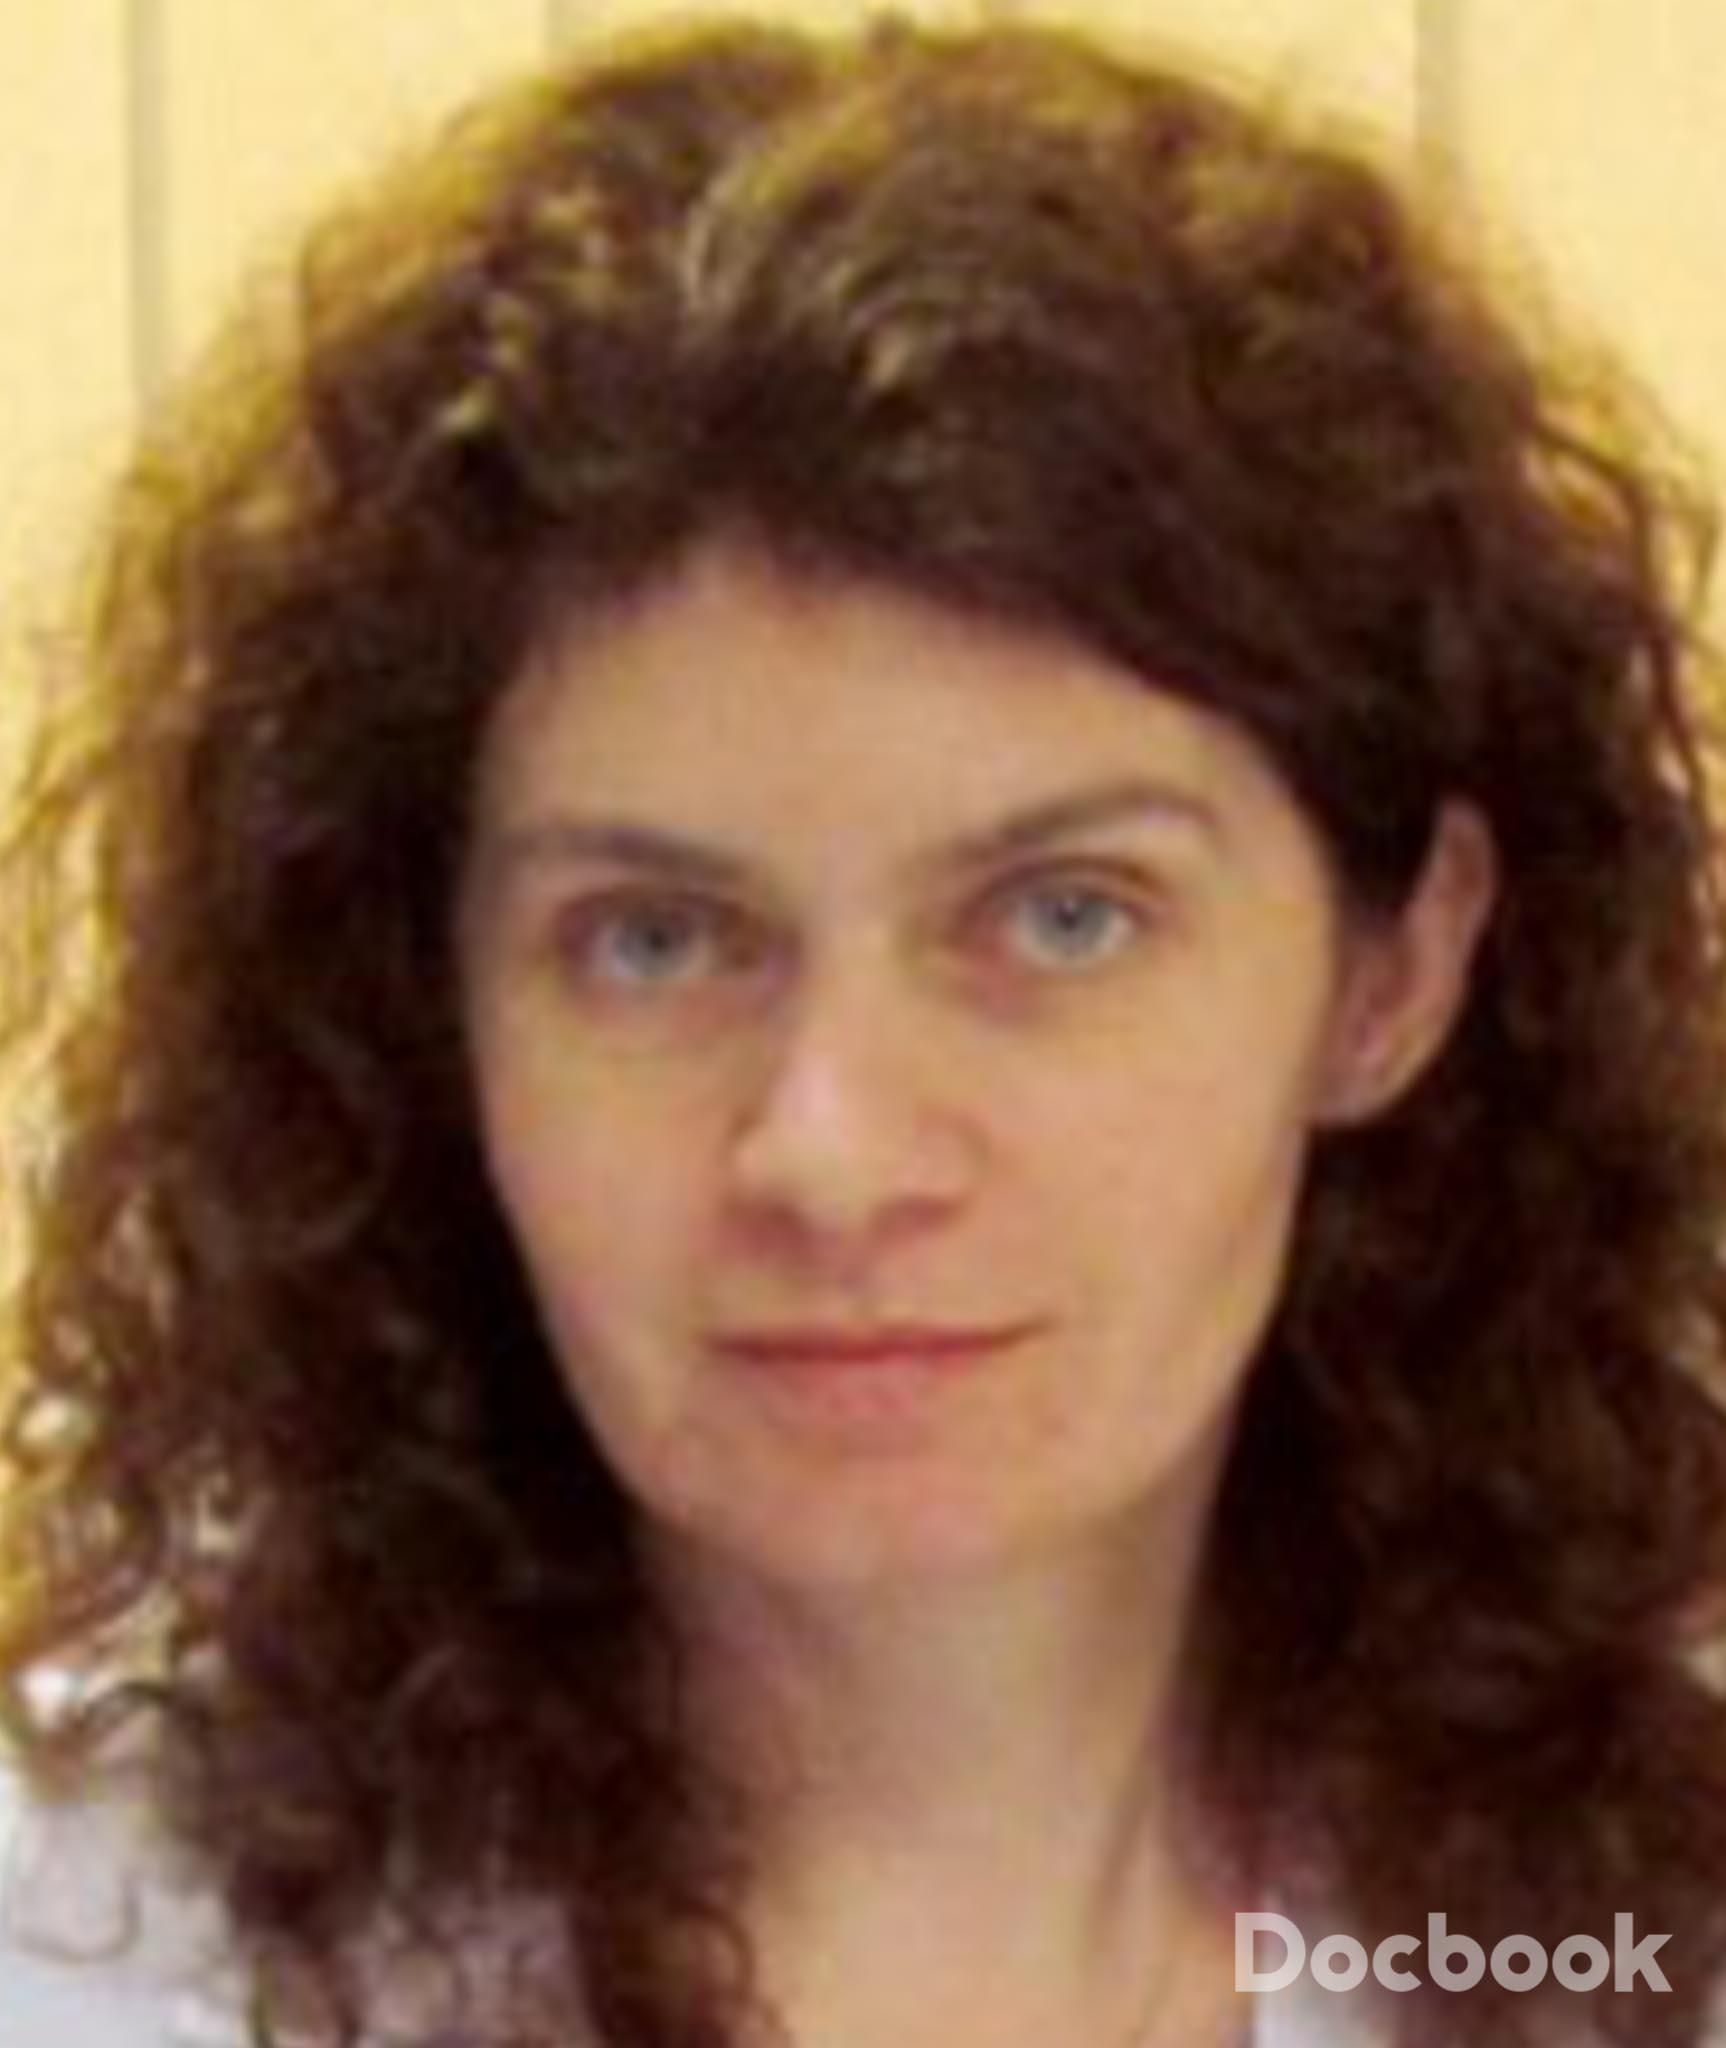 Dr. Caudia Miron